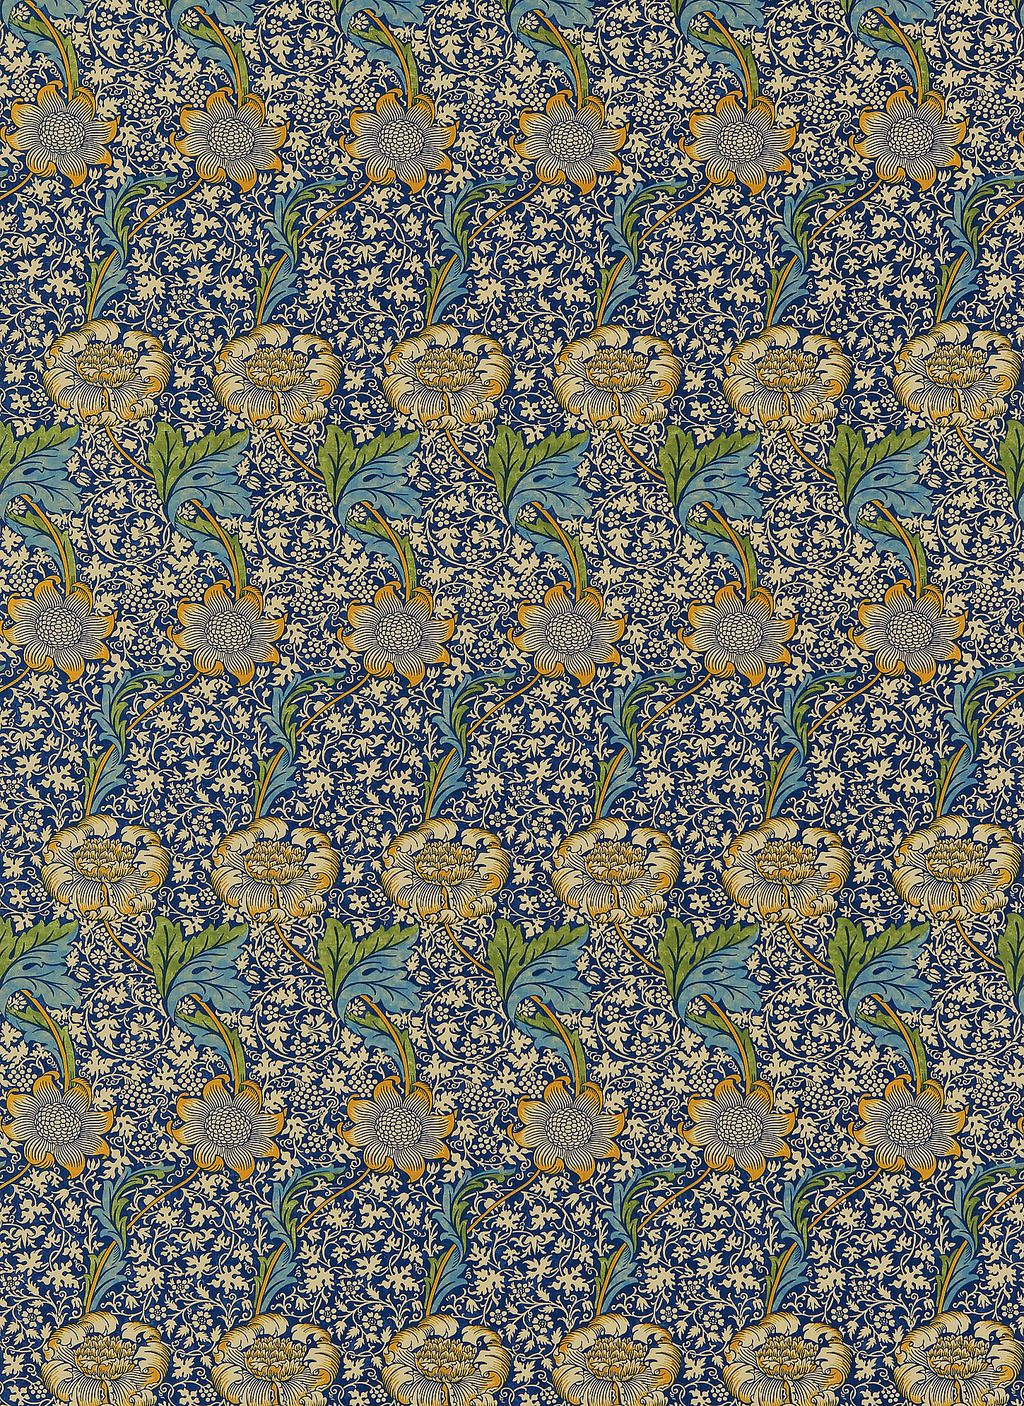 Sample Of Wallpaper By William Morris Designs Kennet 1883